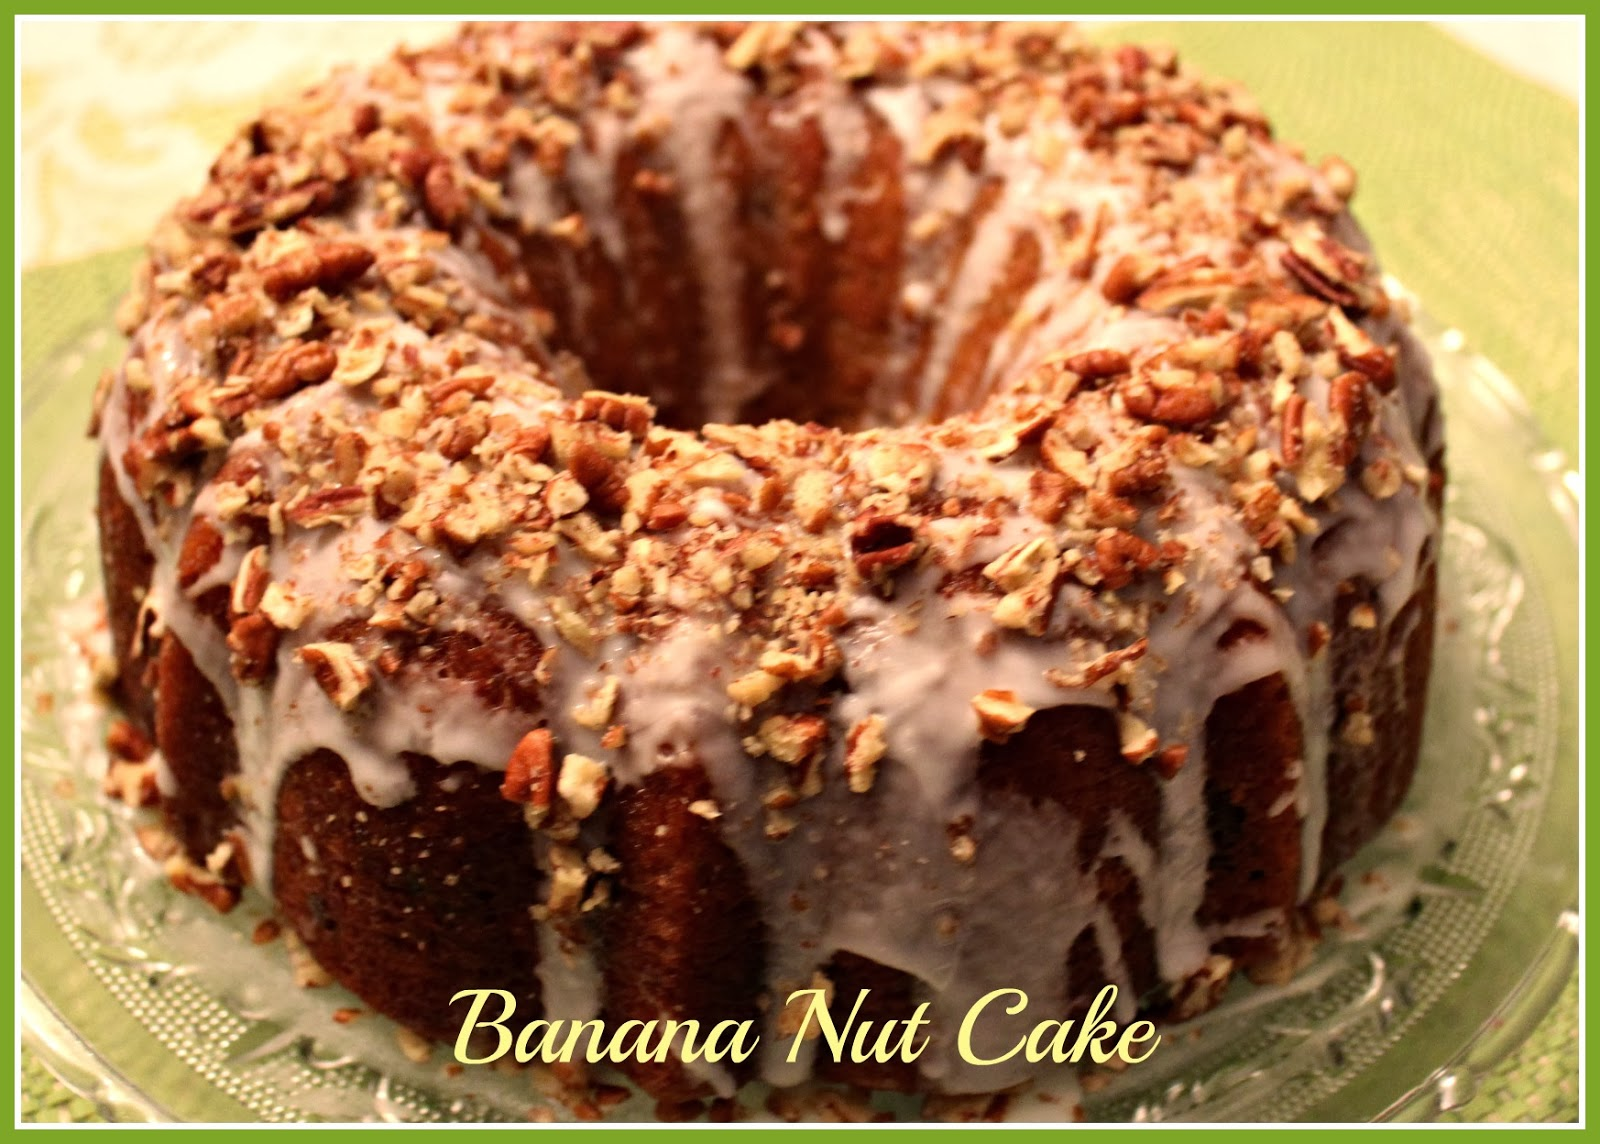 Honey Bun Cake Recipe With Buttermilk